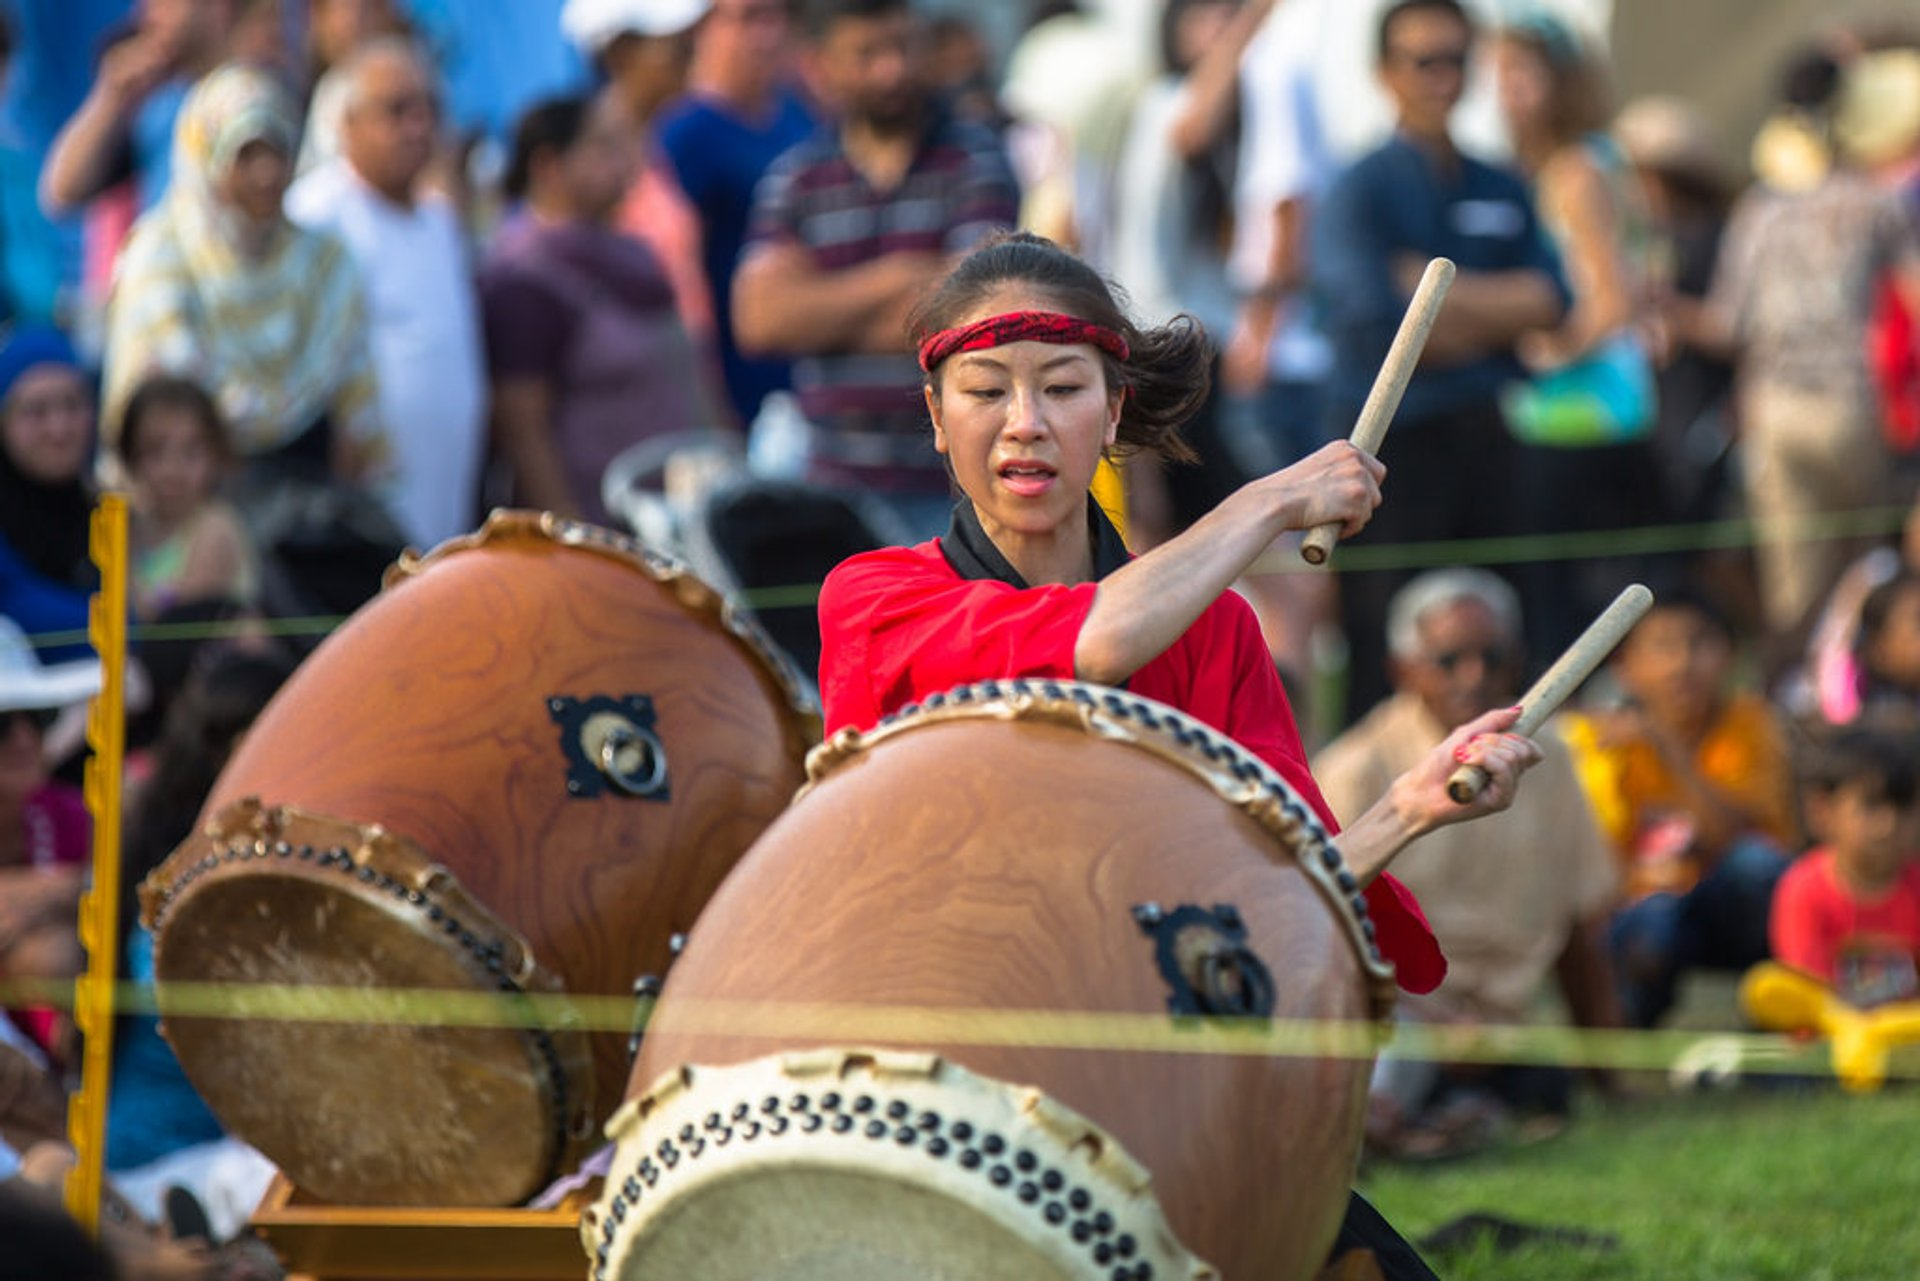 Edmonton Heritage Festival in Edmonton - Best Season